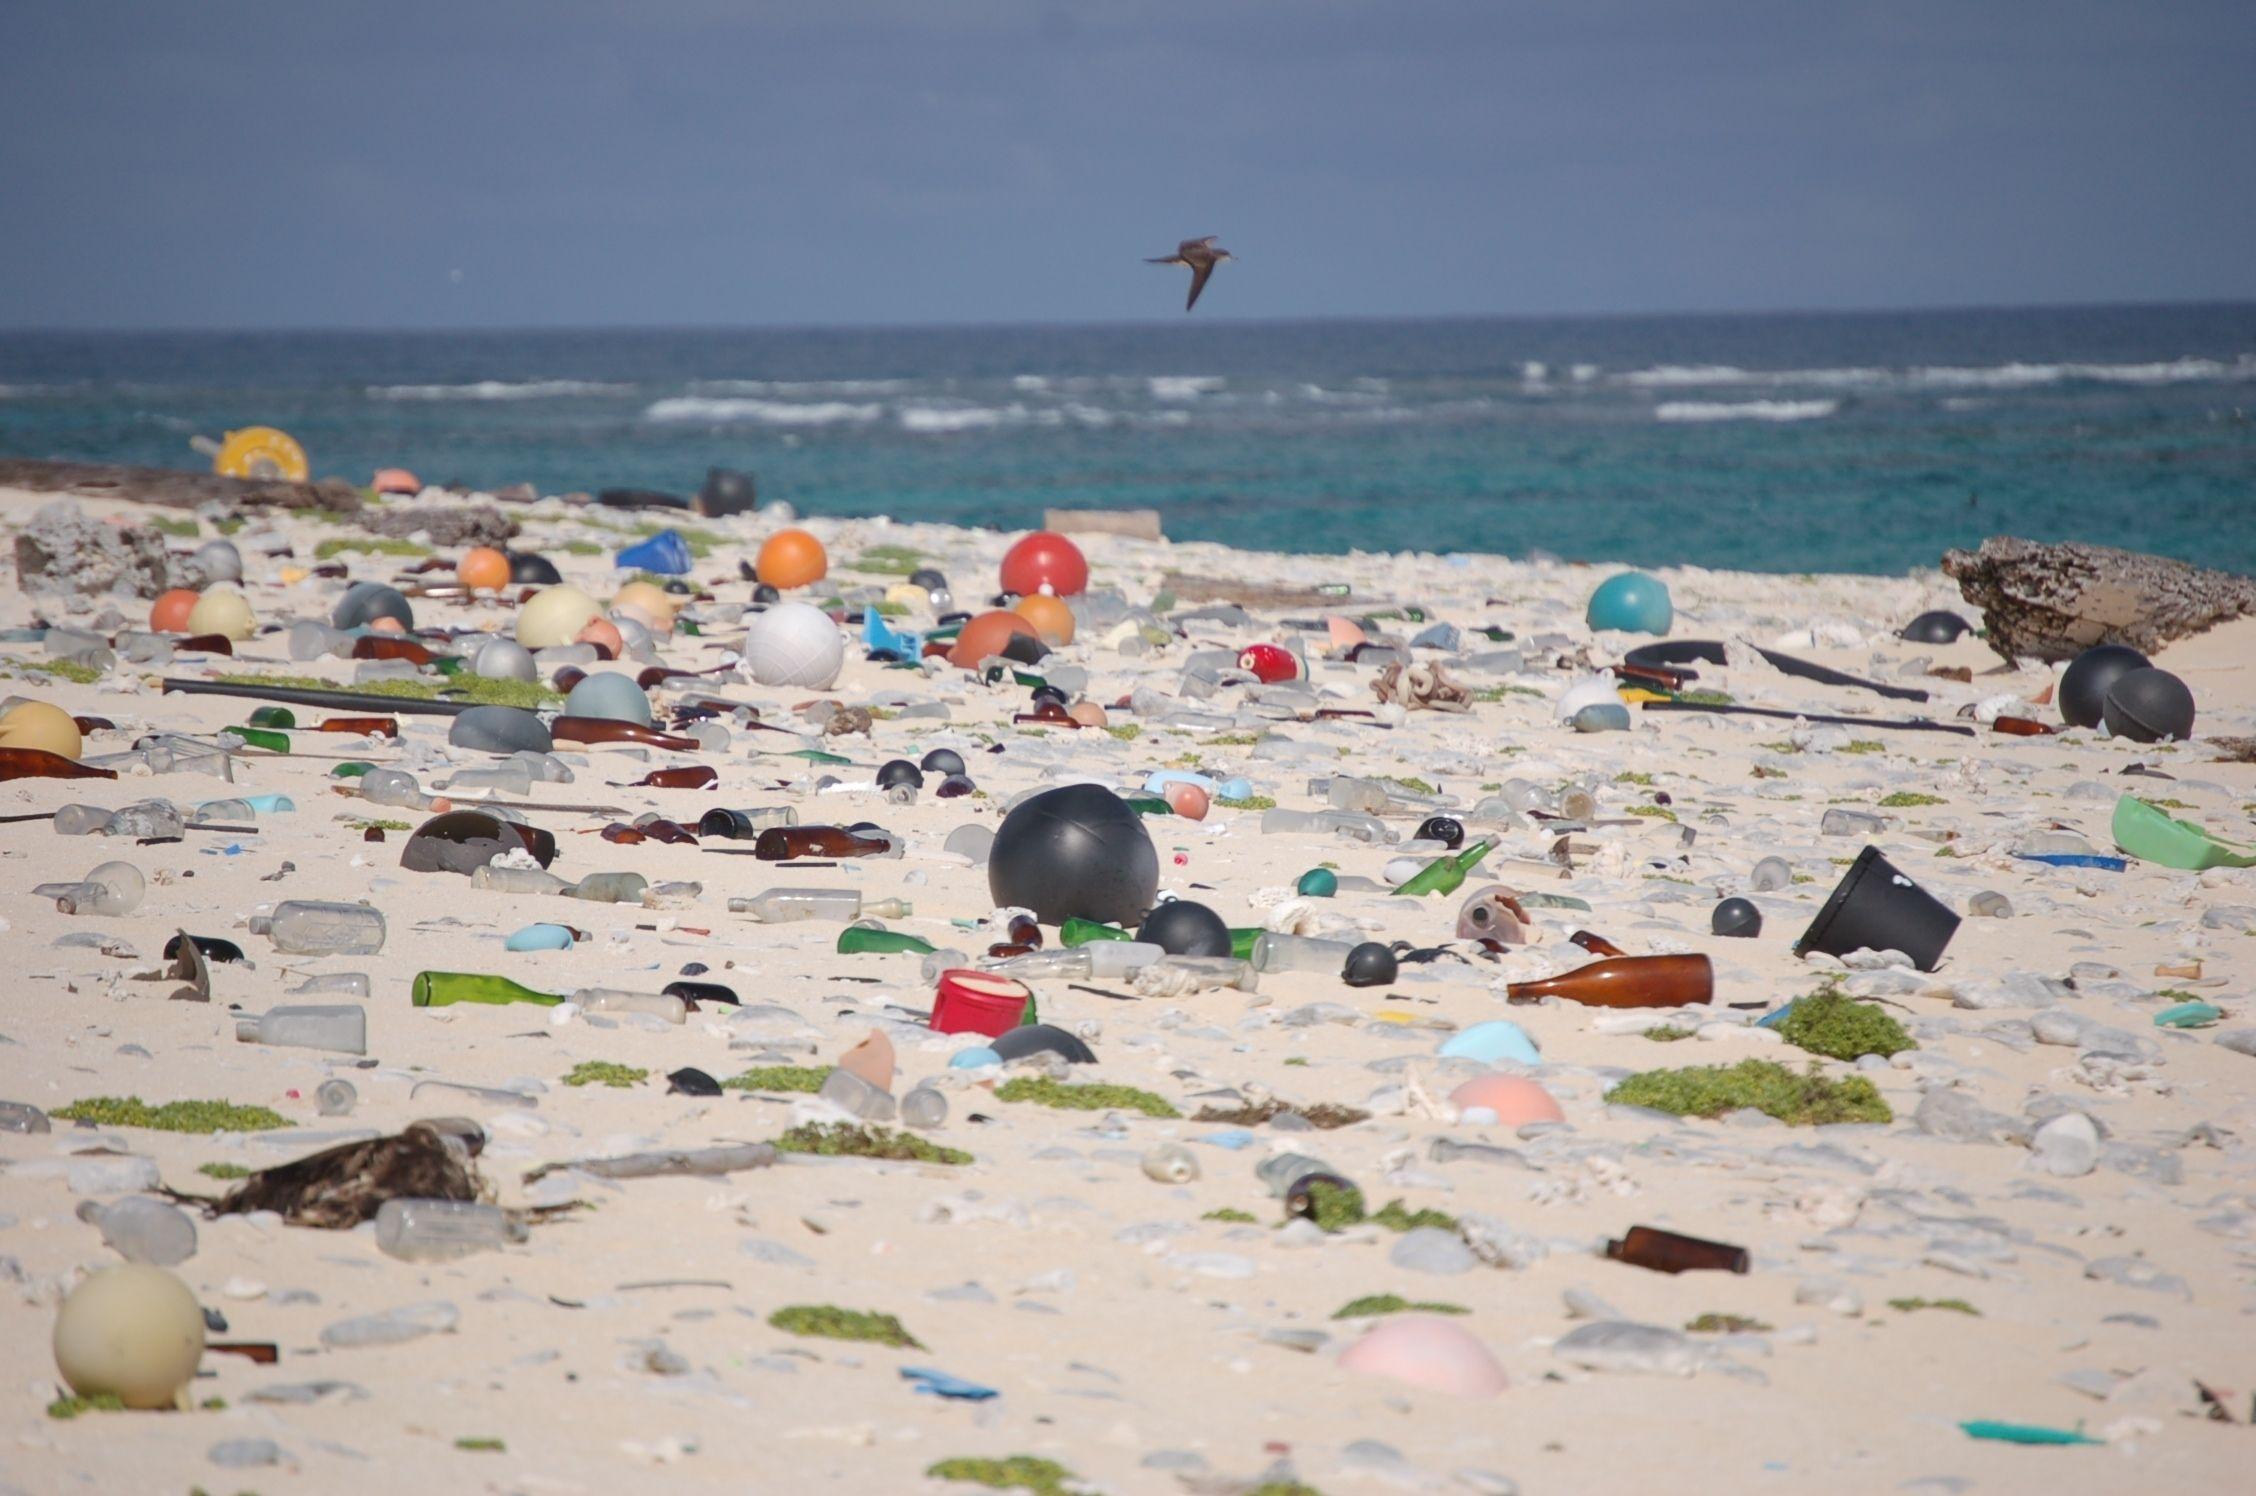 Marine debris litters a beach on Laysan Island in the Hawaiian Islands National Wildlife Refuge, where it washed ashore. Photo © U.S. Fish and Wildlife